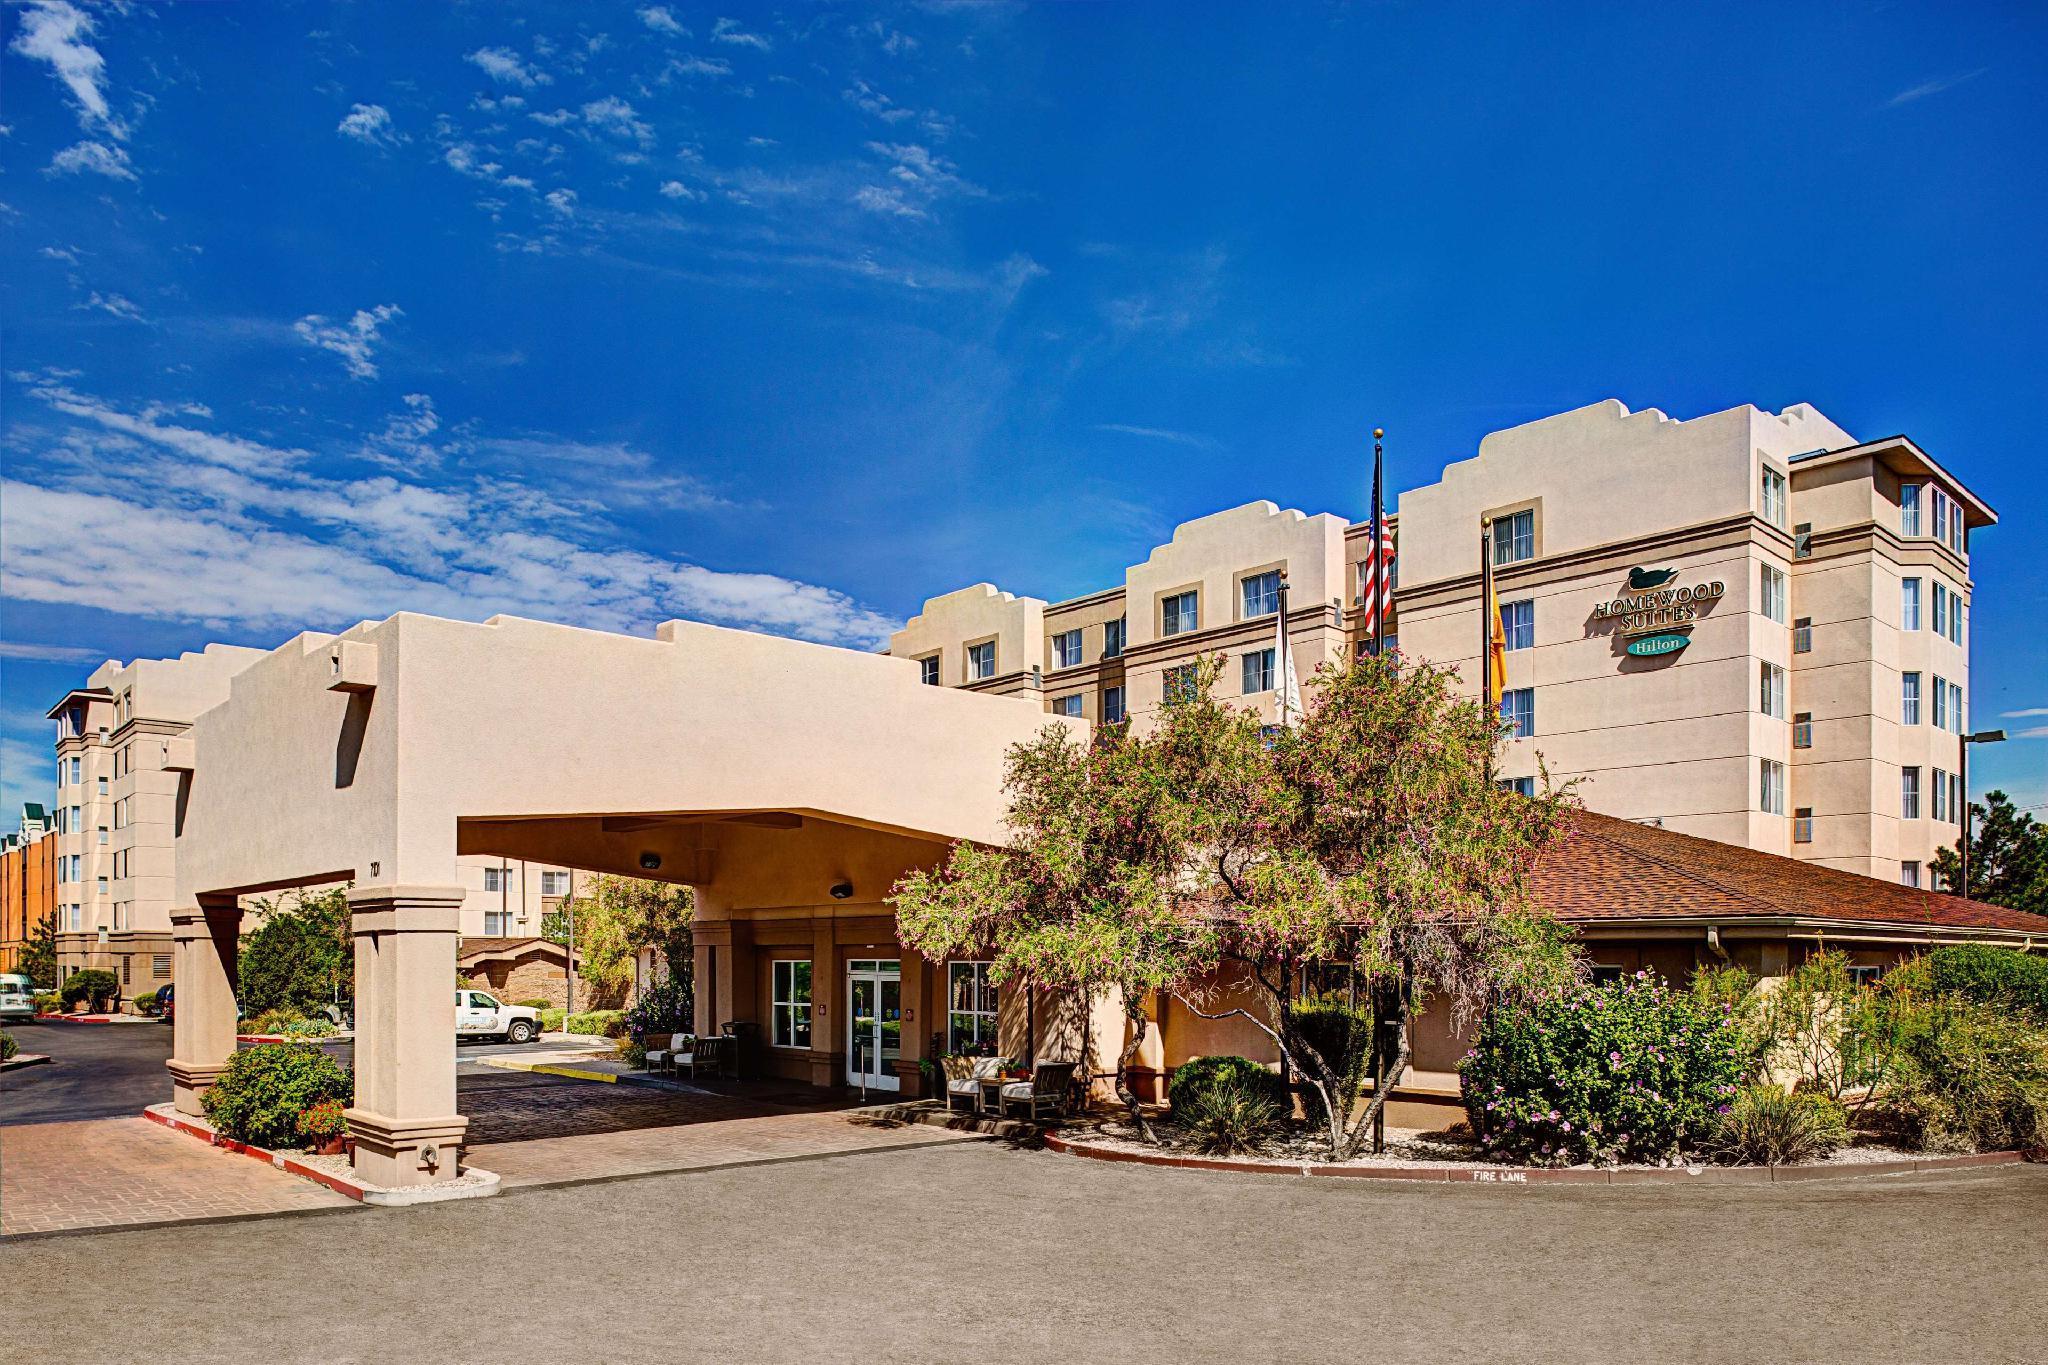 Homewood Suites By Hilton Albuquerque Uptown Hotel